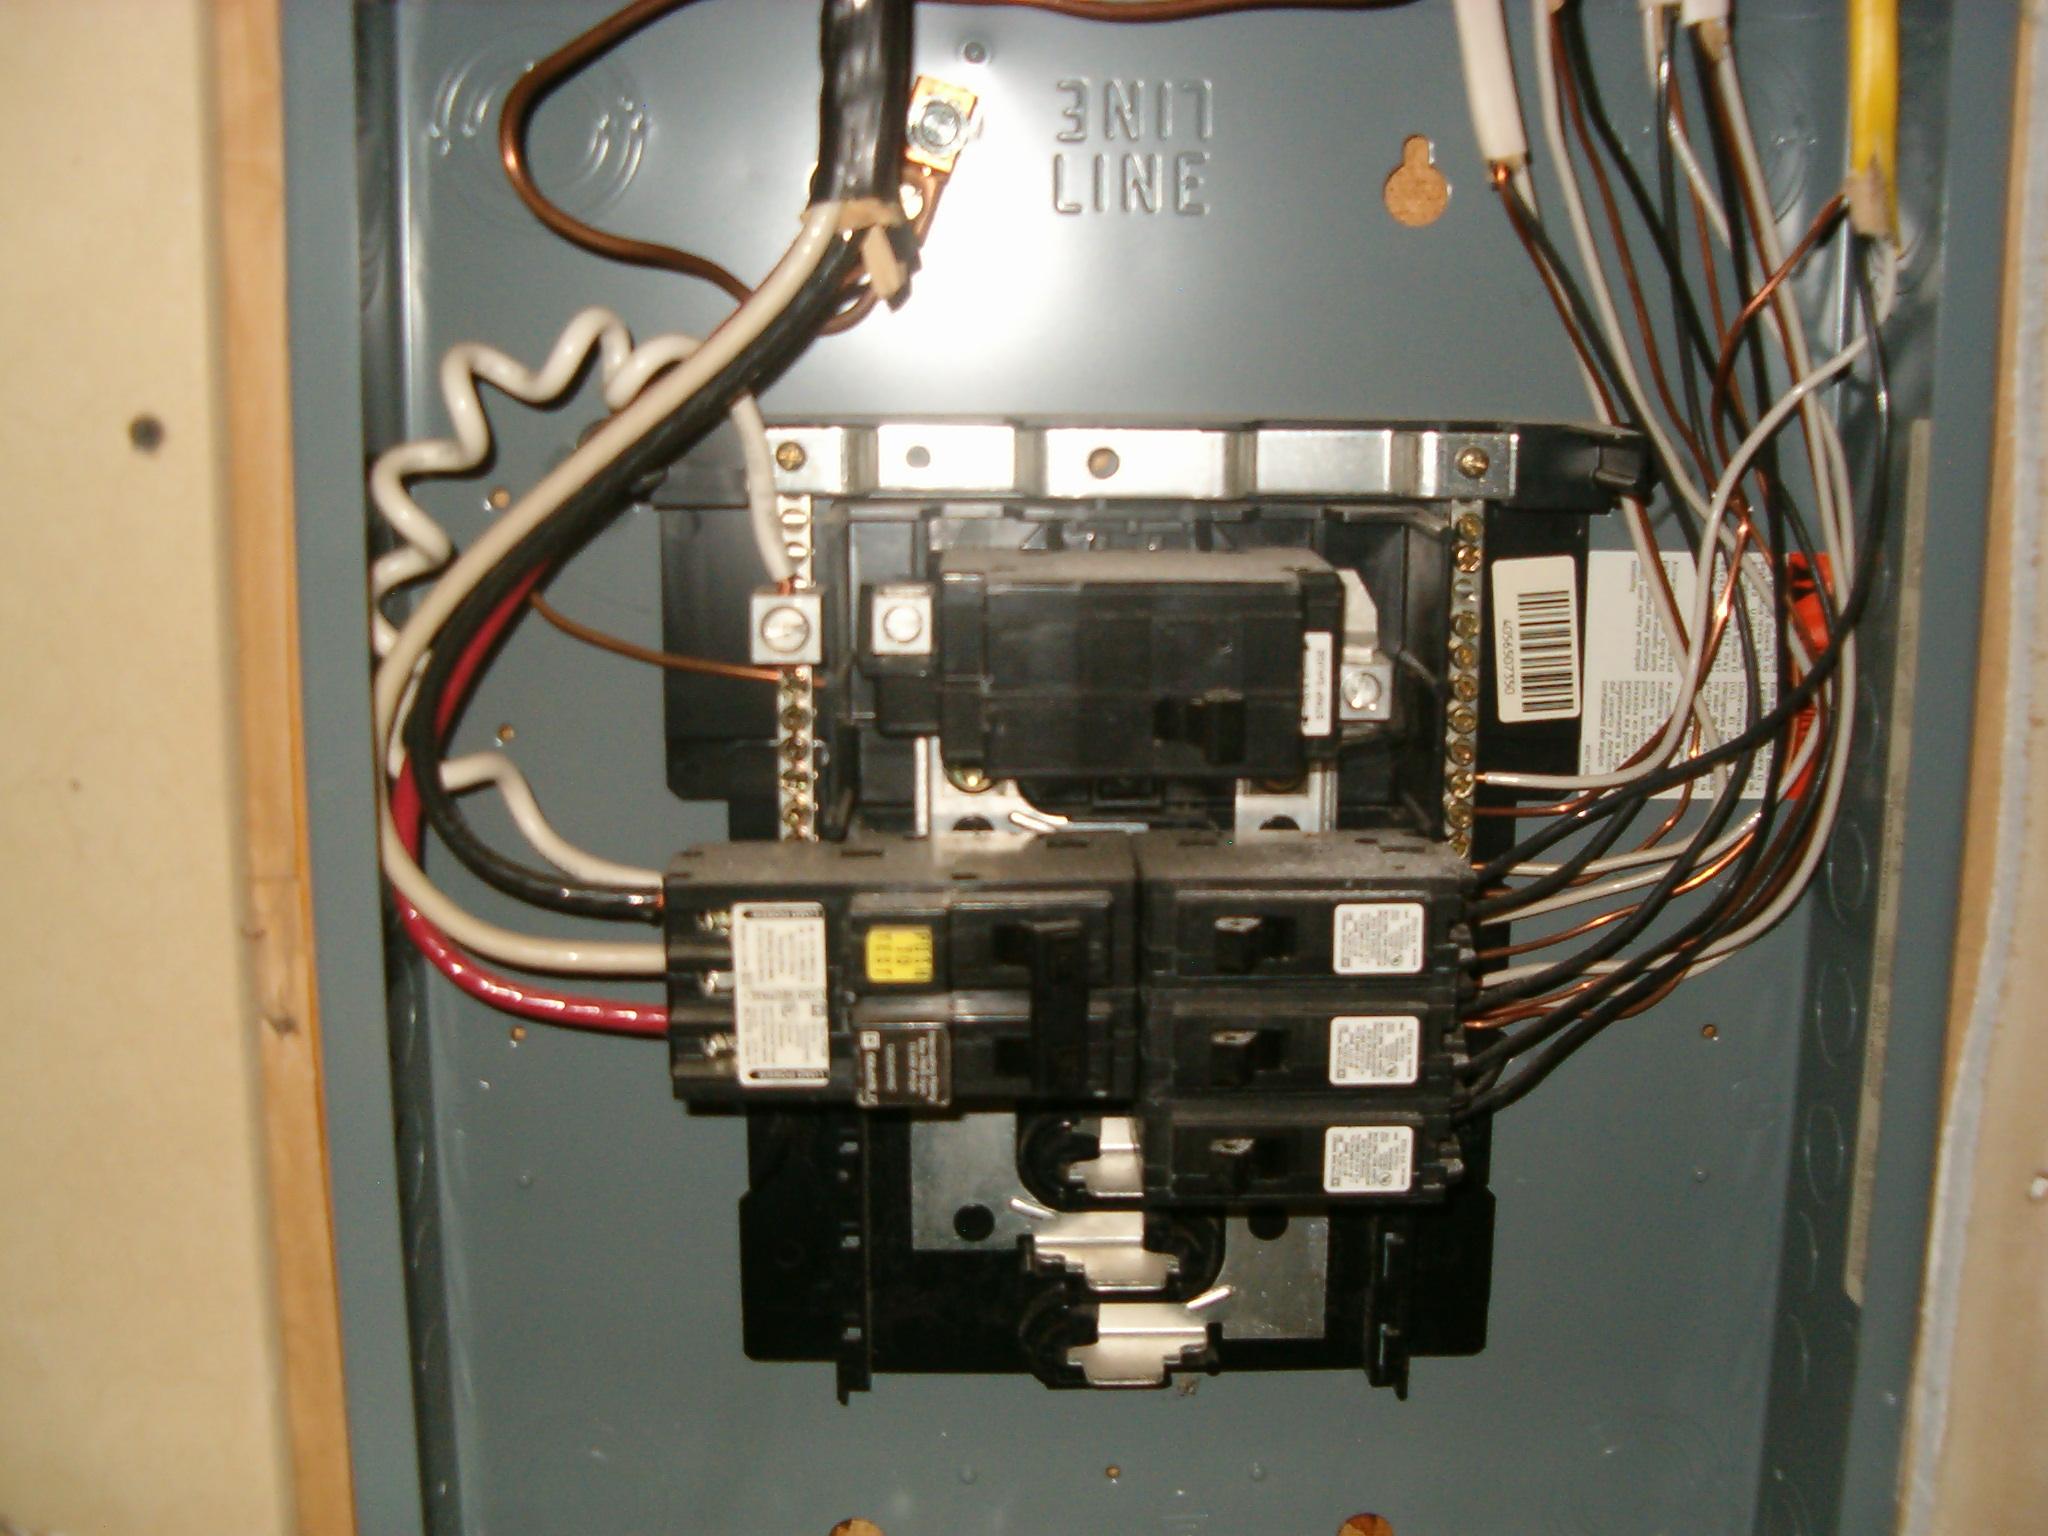 Wiring Gfci Breaker Sub Panel Car Diagrams Explained 50 Diagram Furthermore Hot Tub 220 Subpanel Fed Into Internachi Rh Nachi Org Siemens Troubleshoot